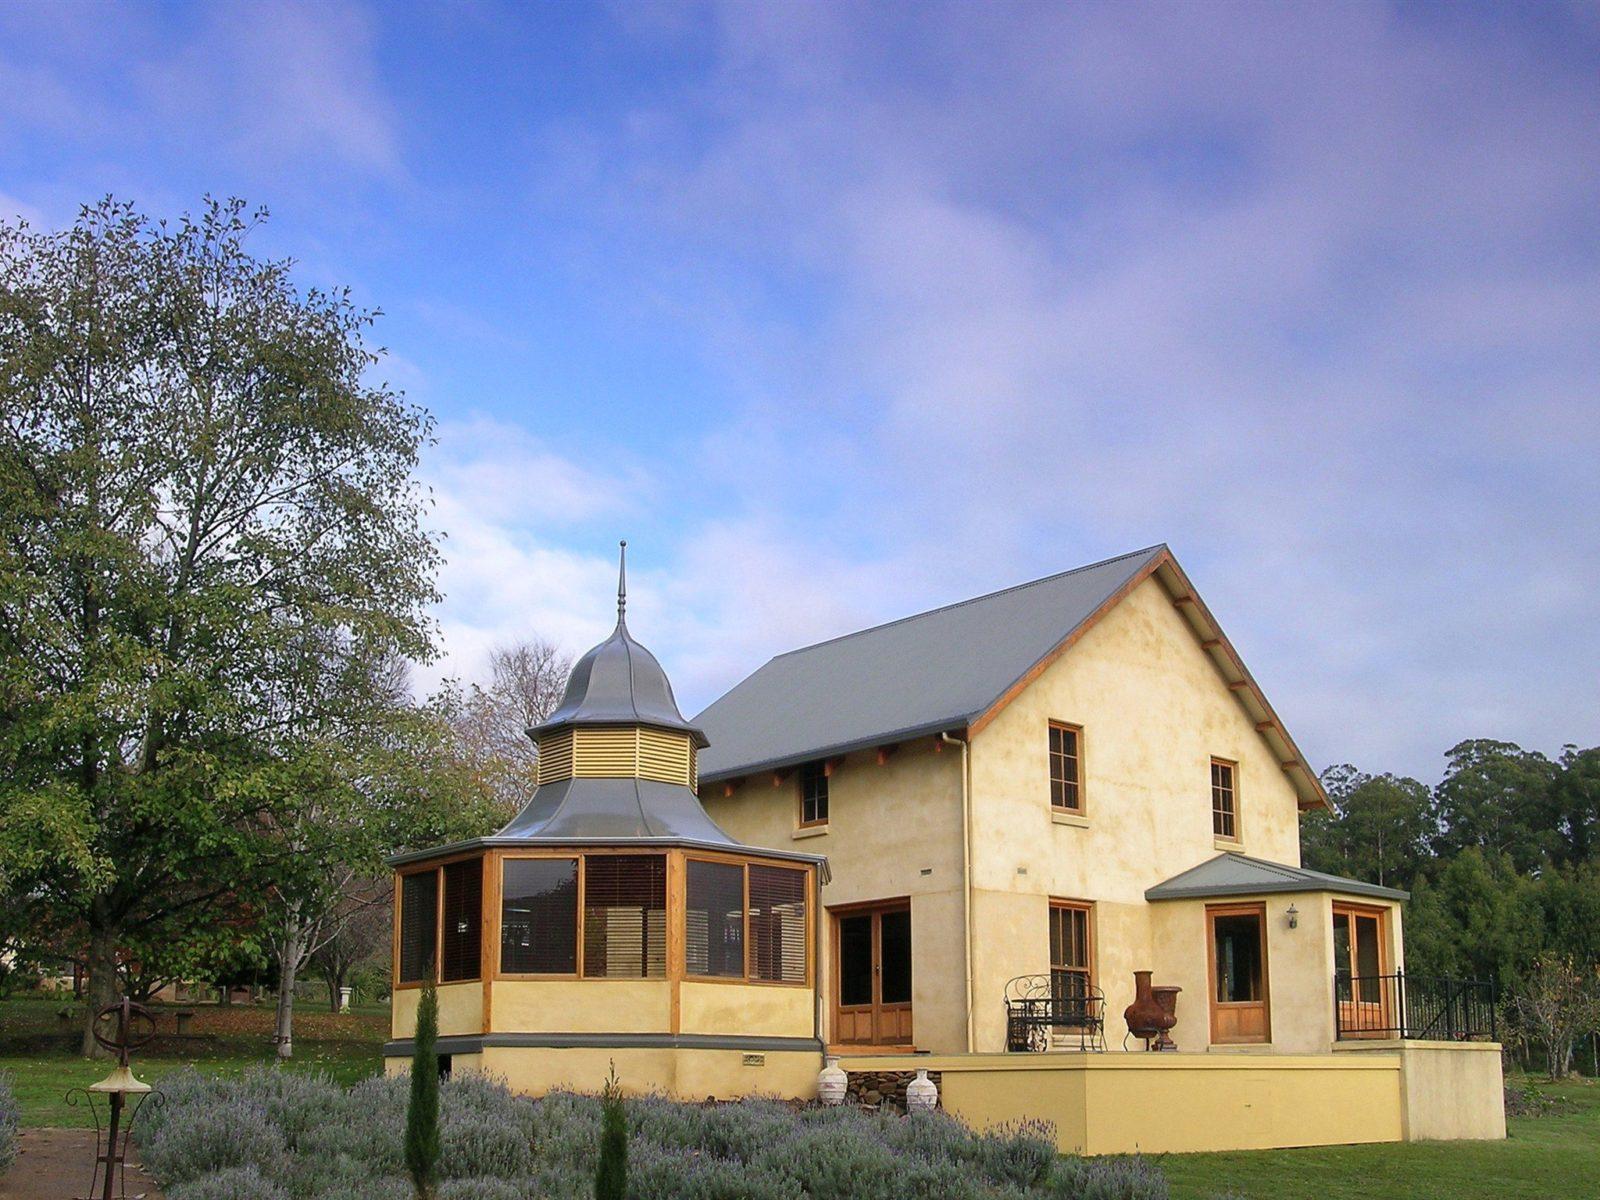 Kentisbury Country House